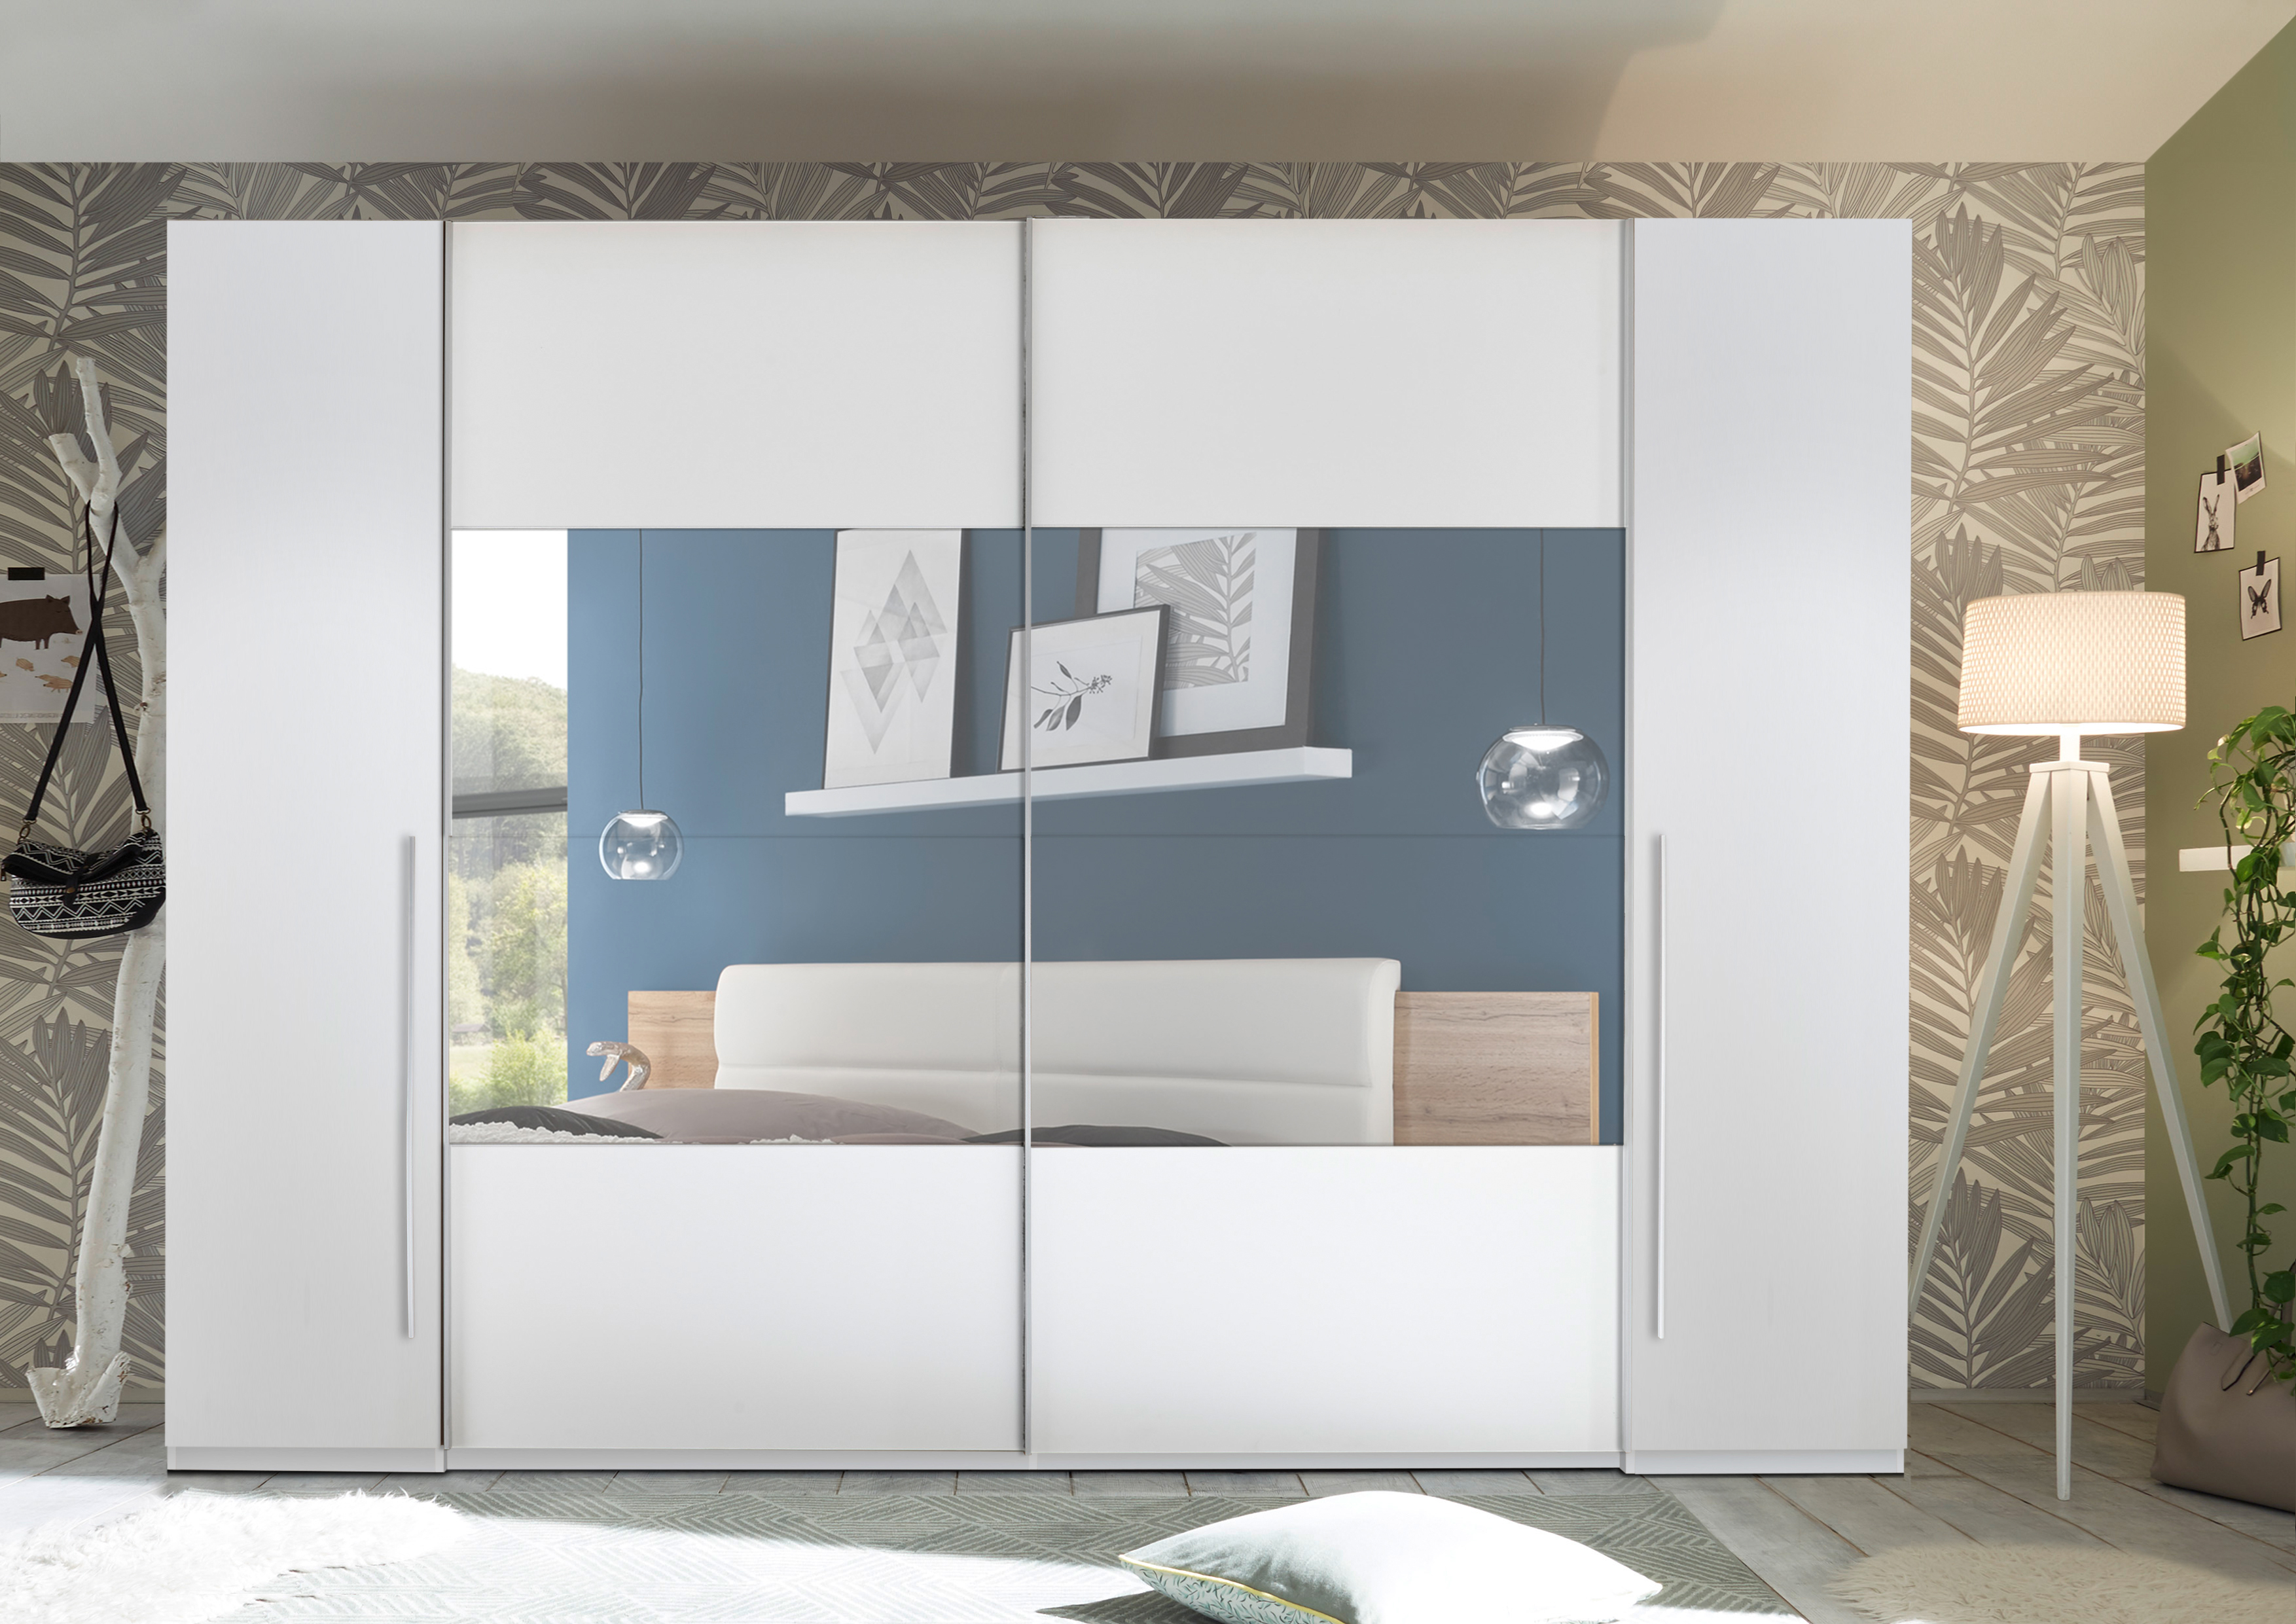 schwebet renschrank mega schiebet ren schrank. Black Bedroom Furniture Sets. Home Design Ideas